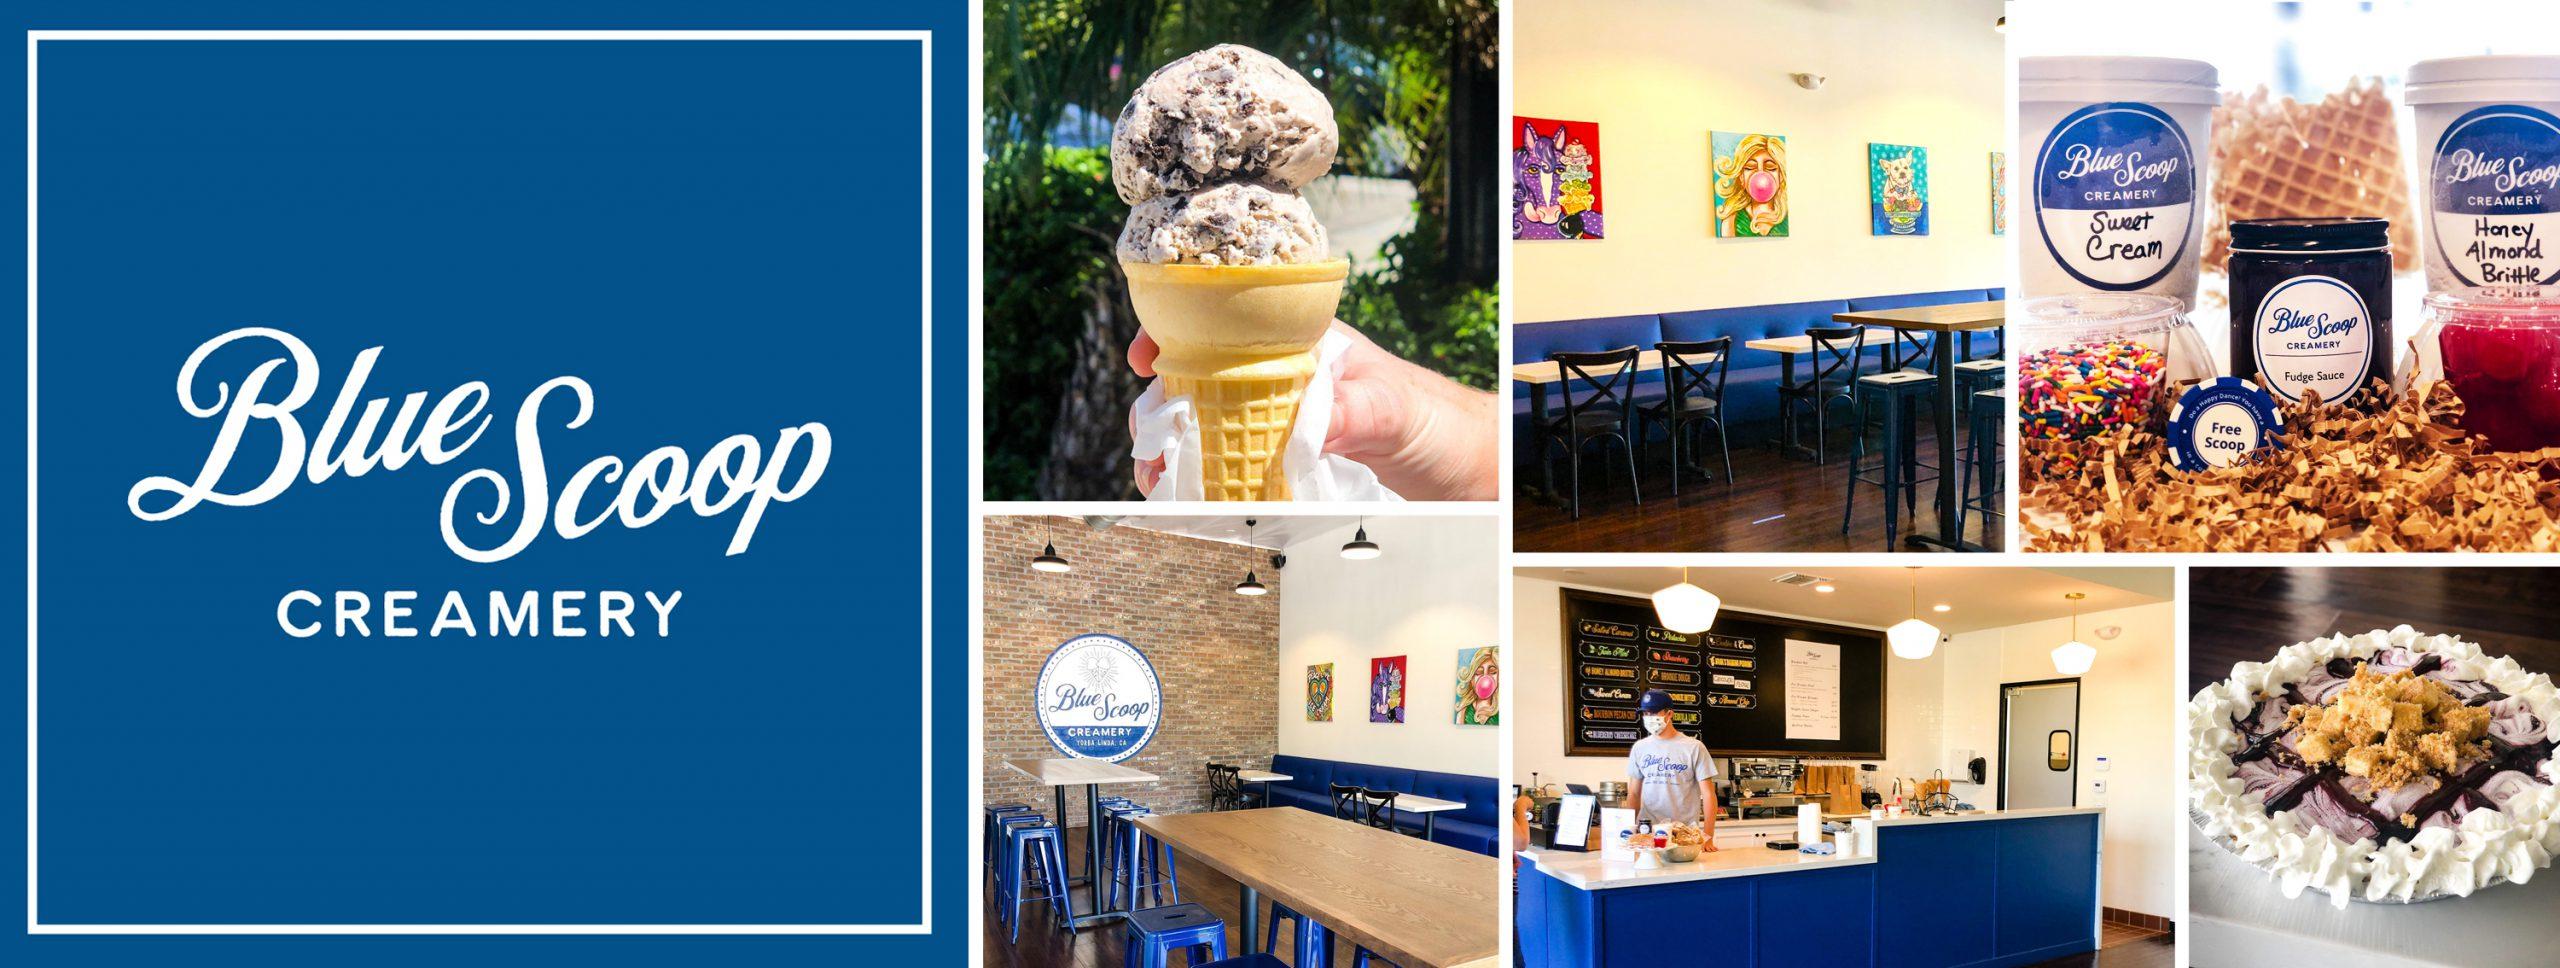 Blue Scoop Creamery Ice Cream Store was able to open despite the Coronavirus pandemic. read how